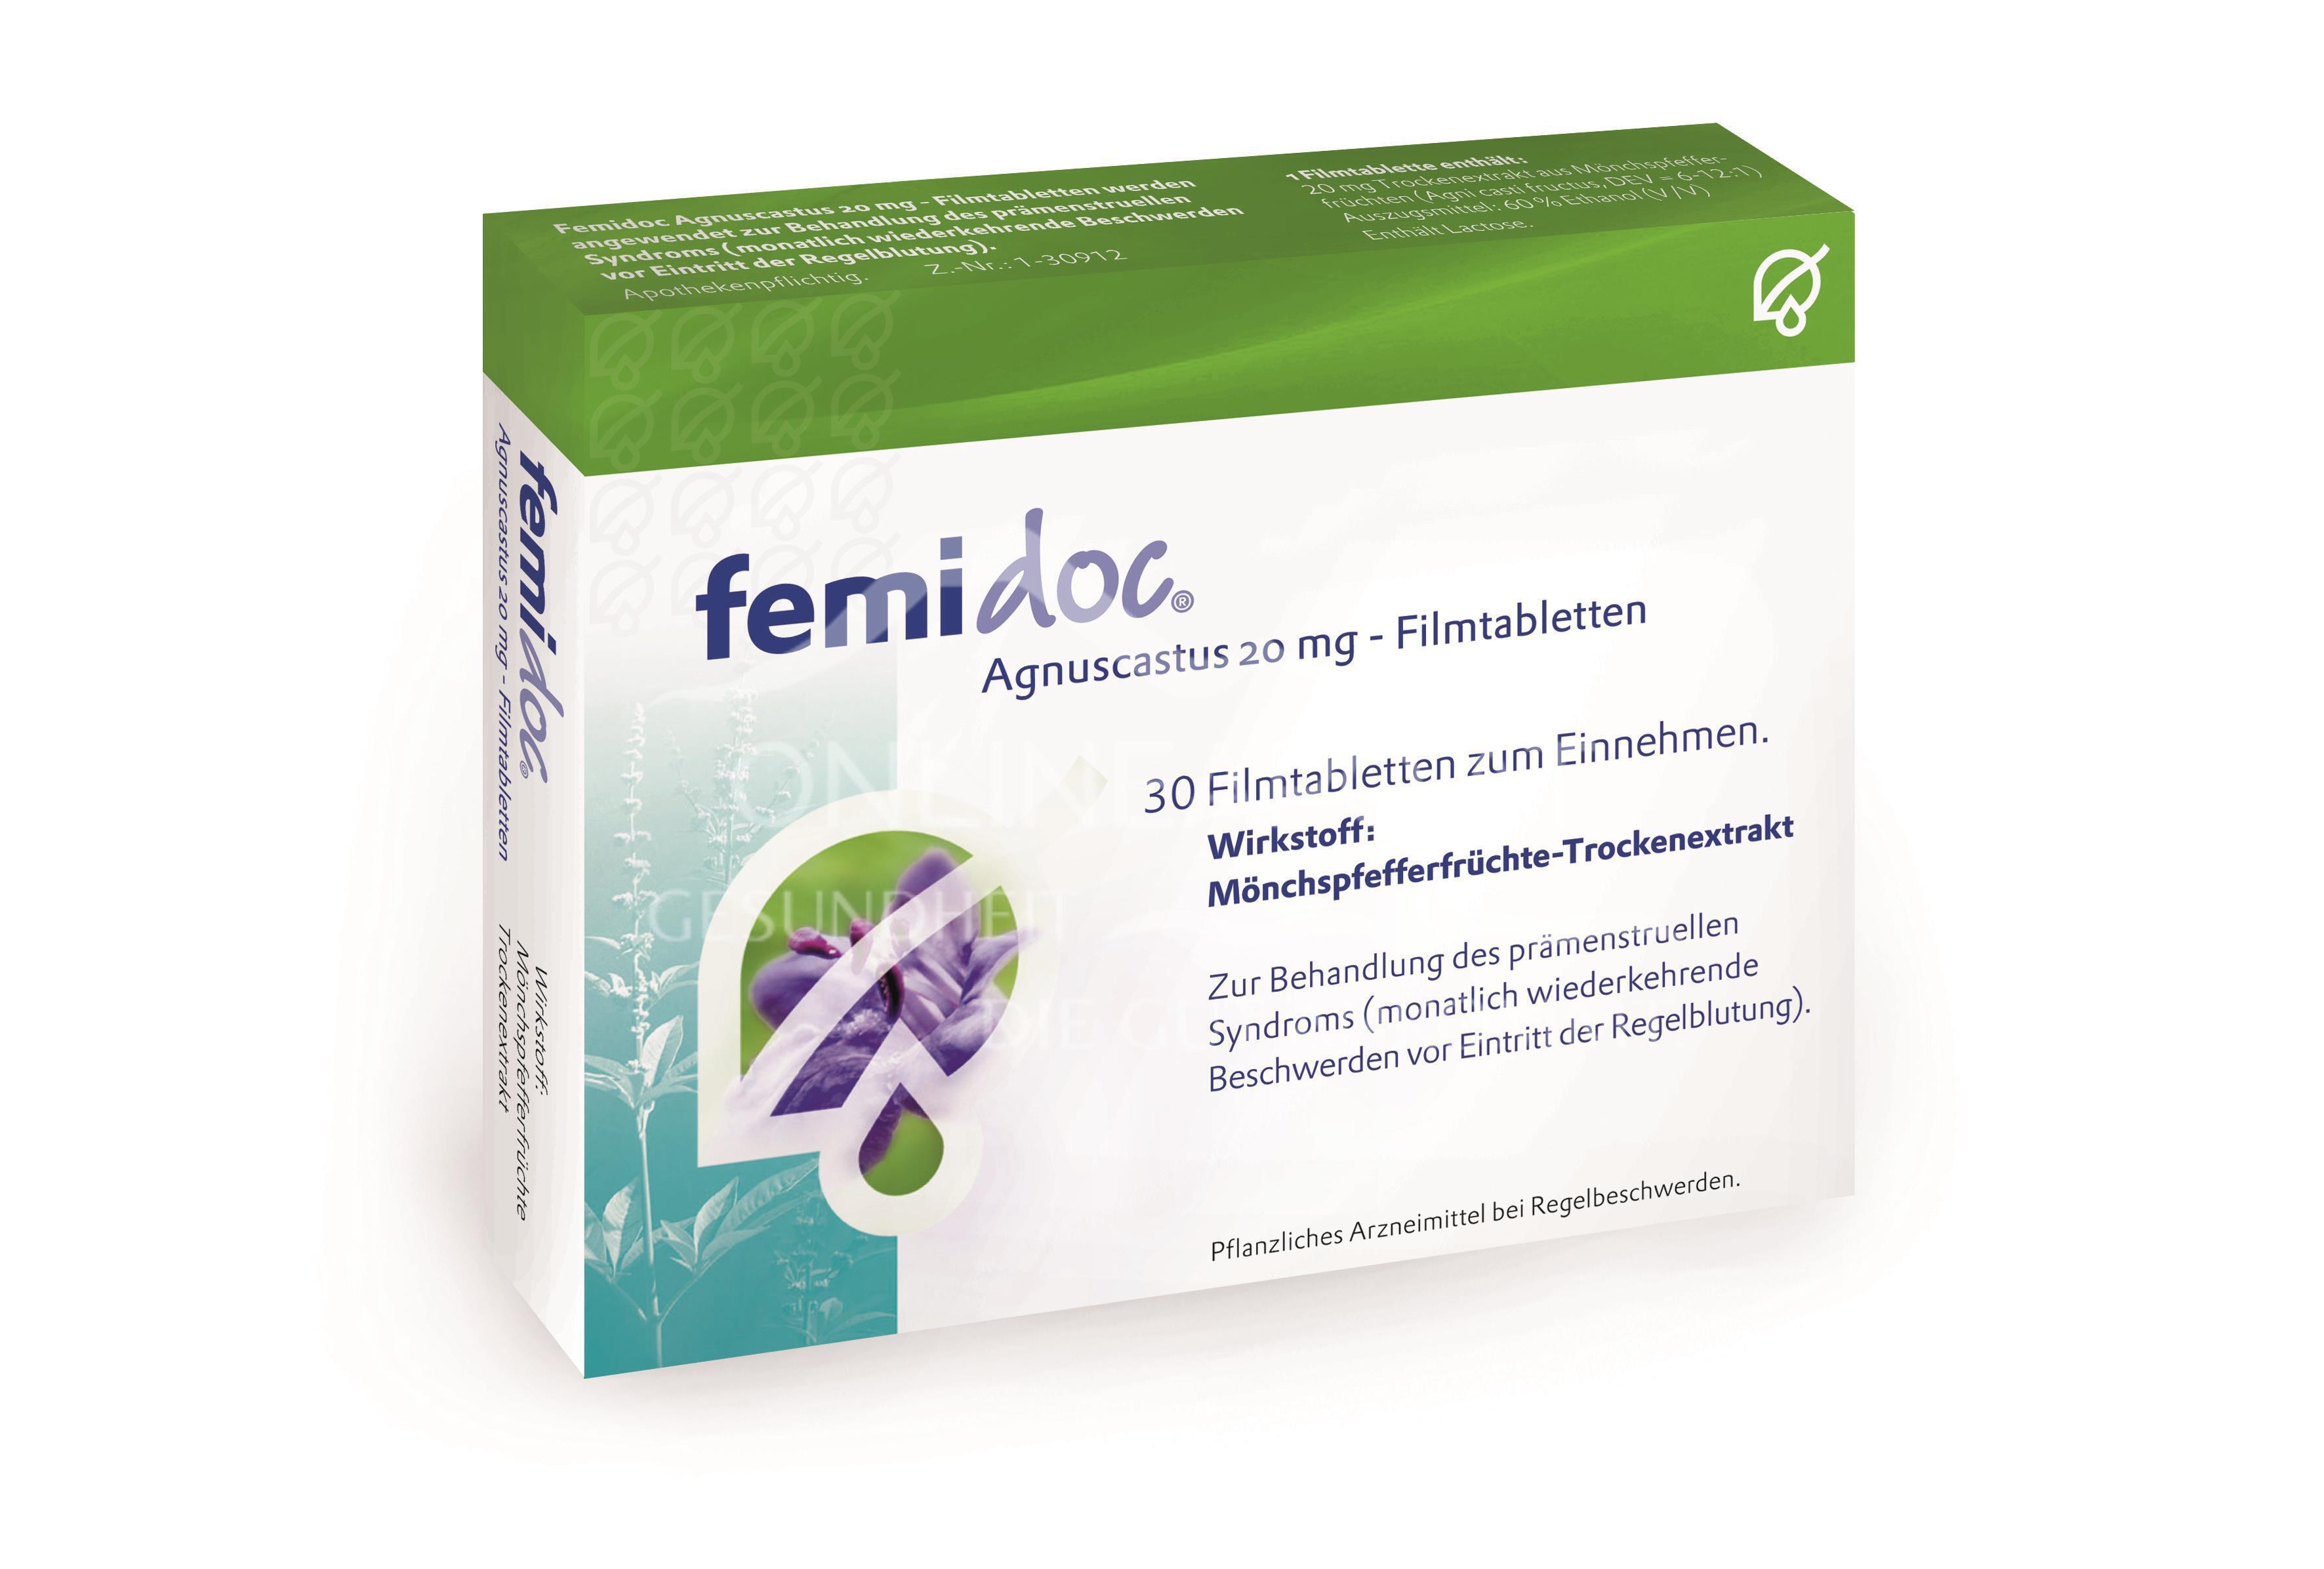 femidoc Agnuscastus 20mg – Filmtabletten